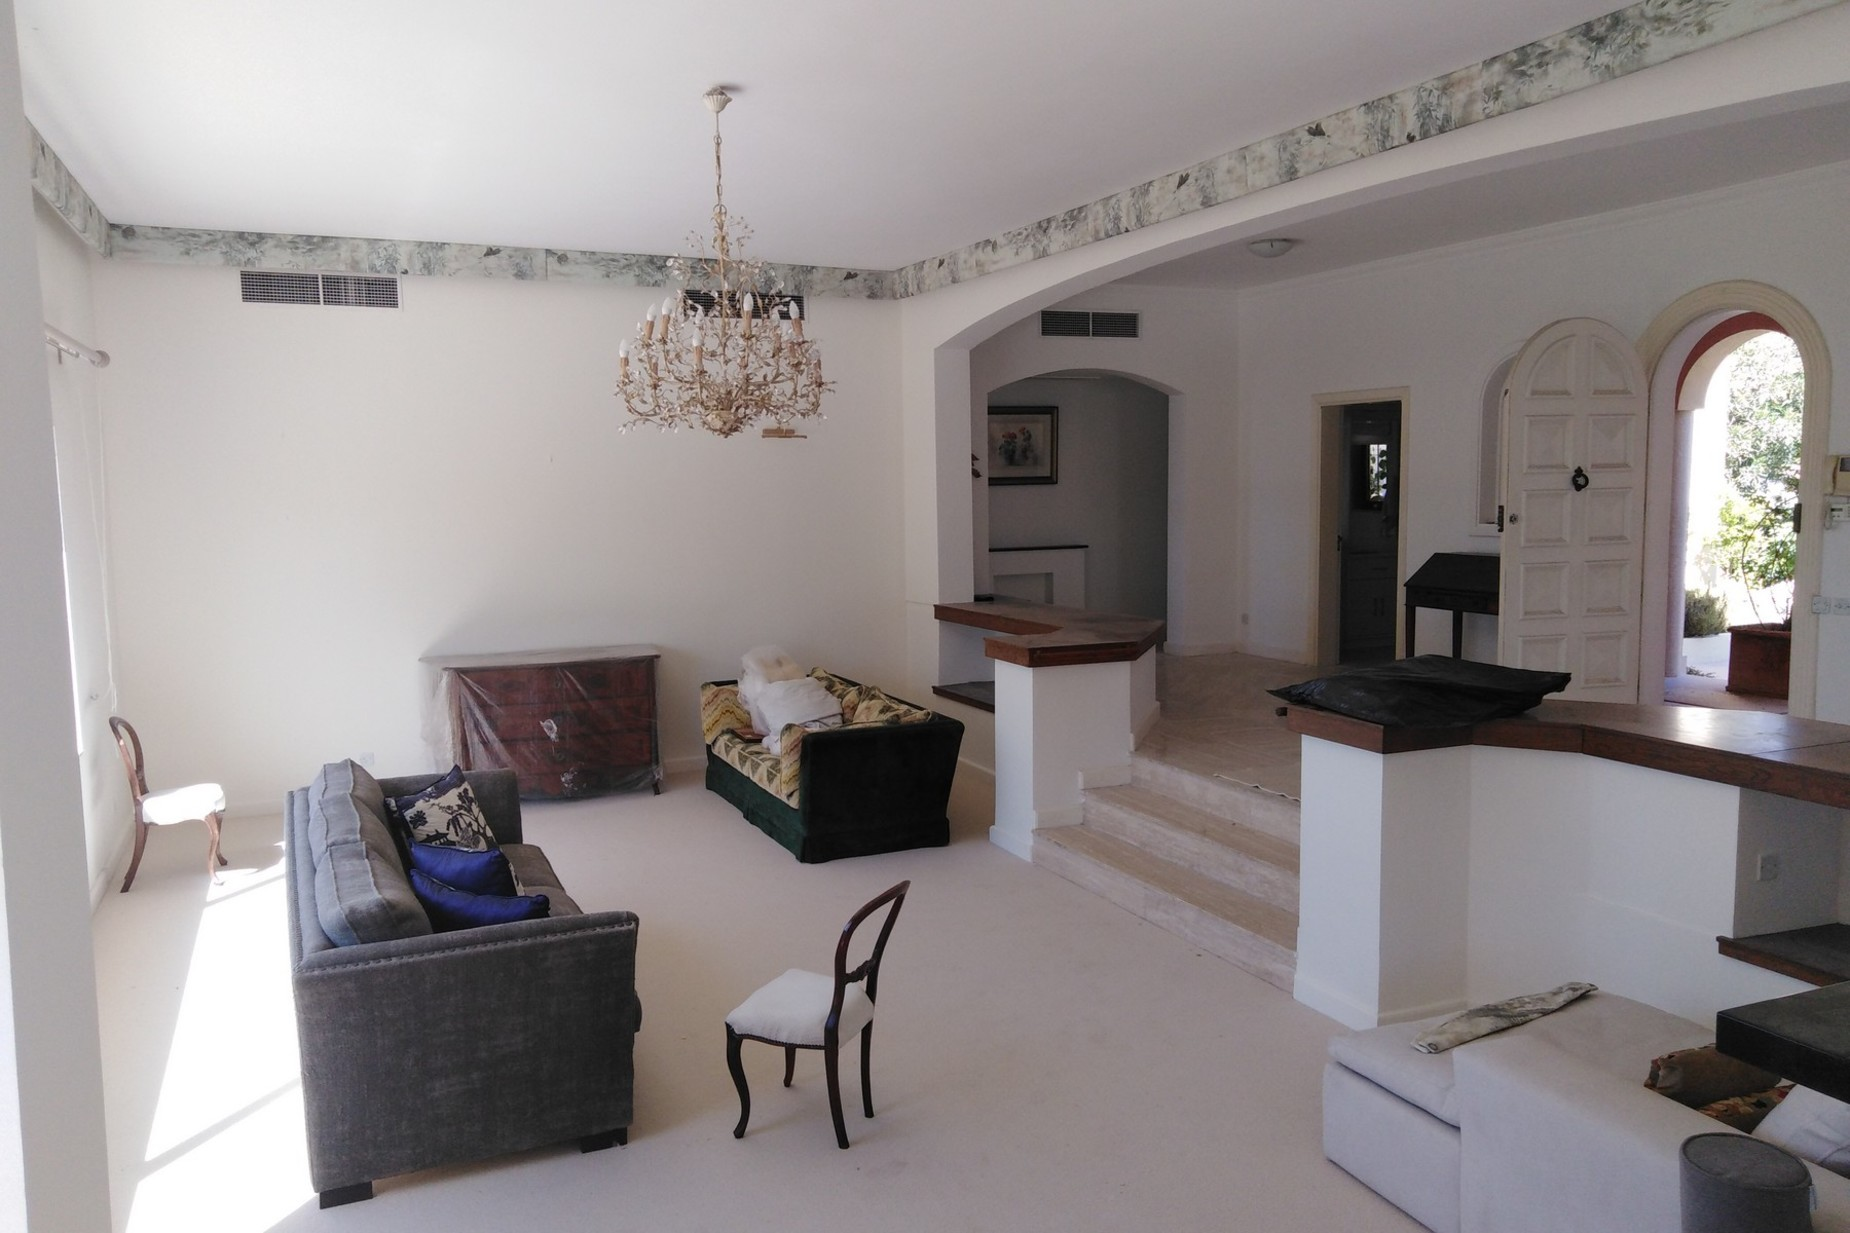 3 bed Villa For Sale in Naxxar, Naxxar - thumb 5